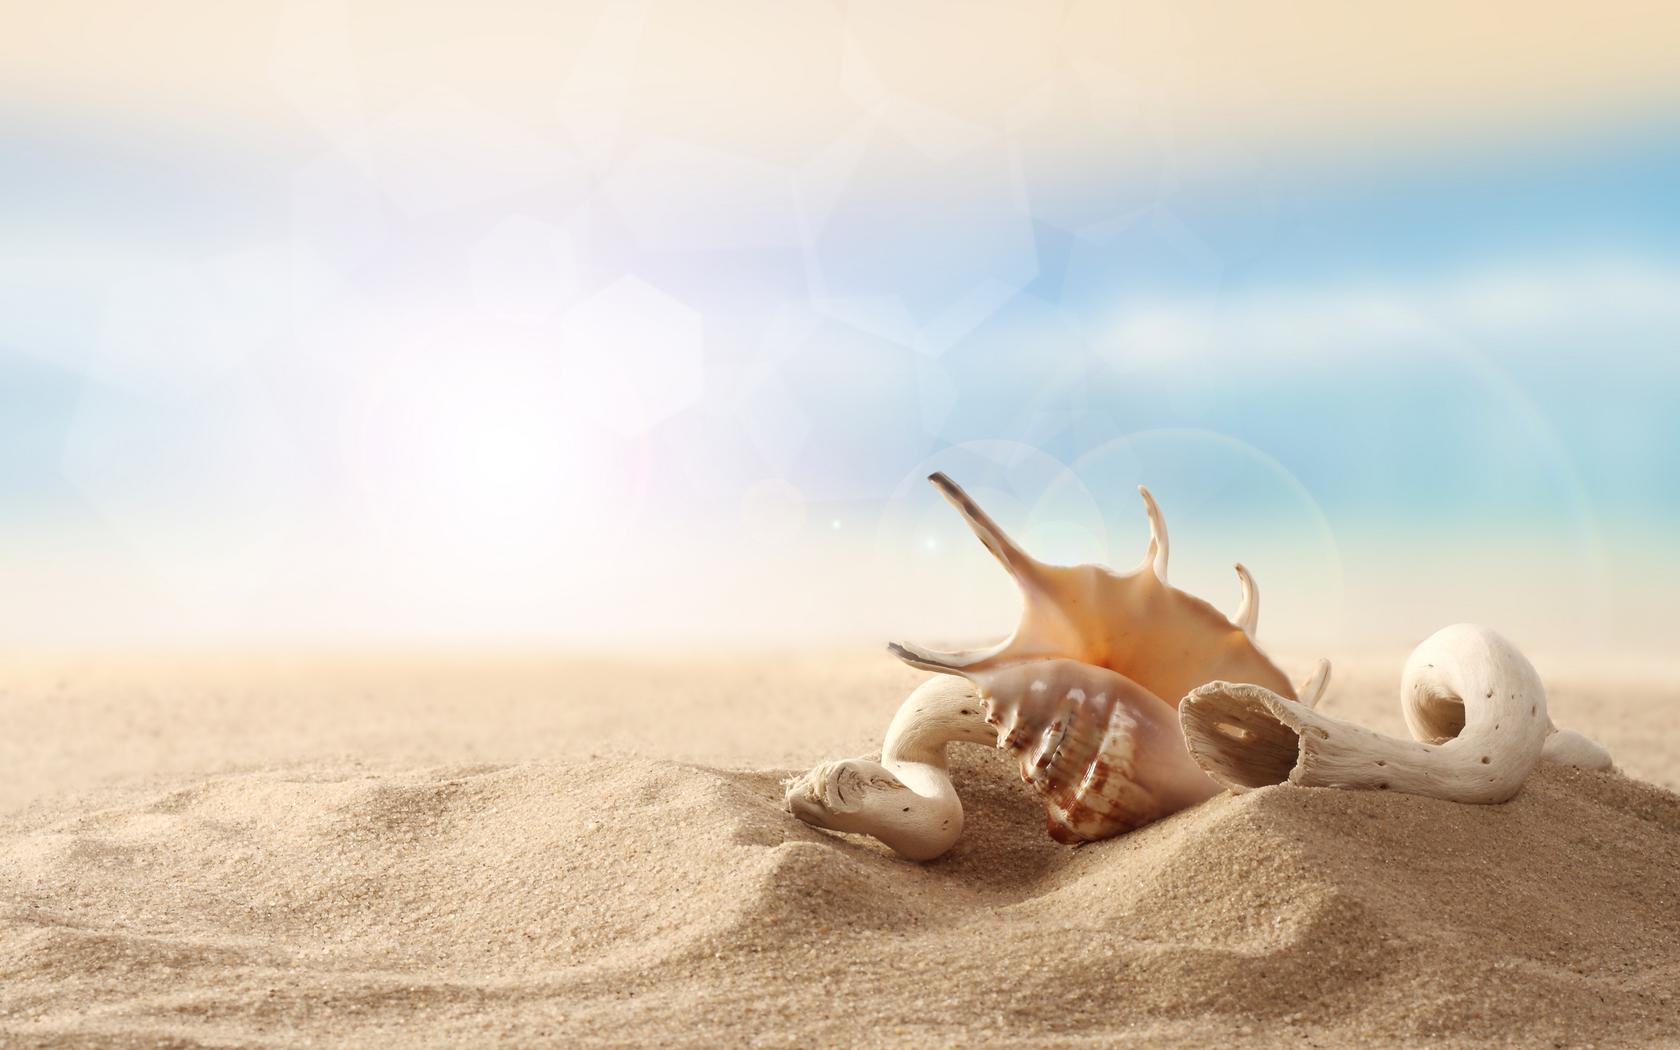 sand wallpaper 22213